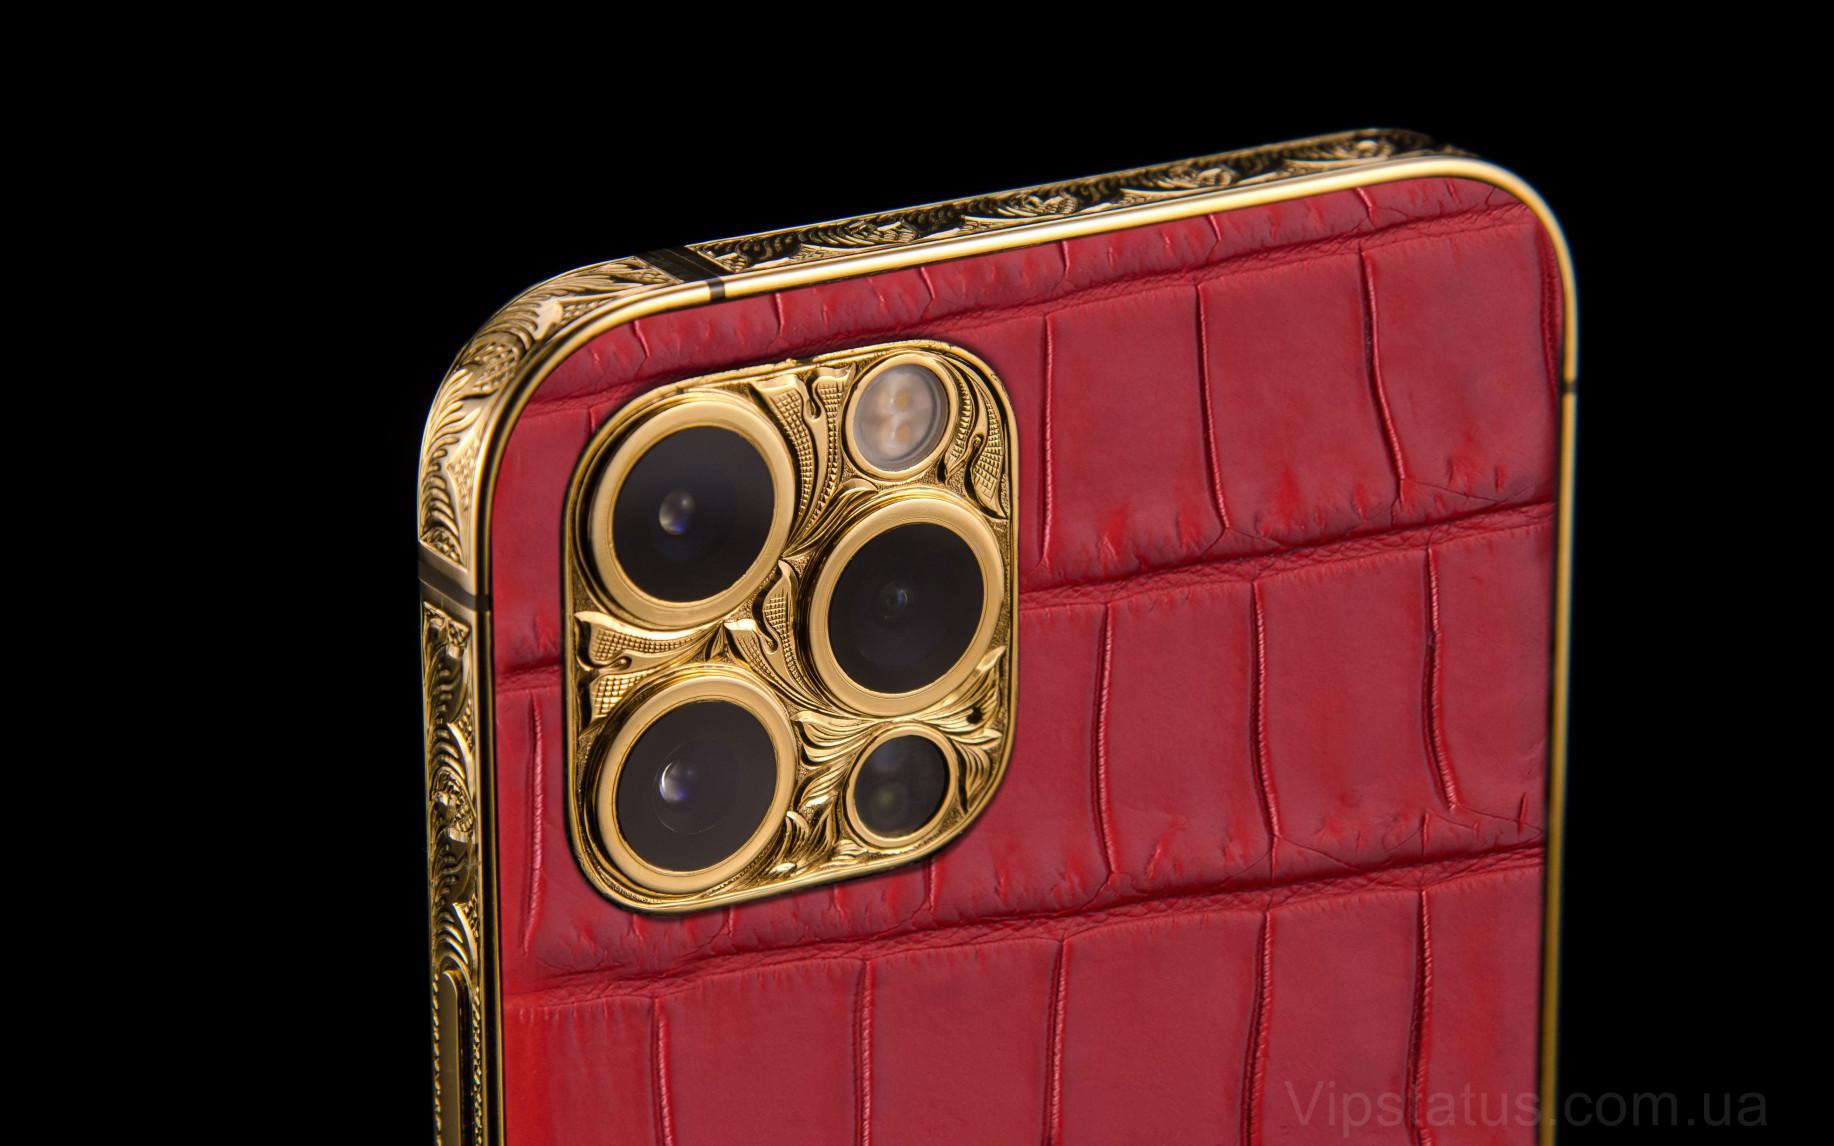 Elite Red Queen IPHONE 12 PRO MAX 512 GB Red Queen IPHONE 12 PRO MAX 512 GB image 2